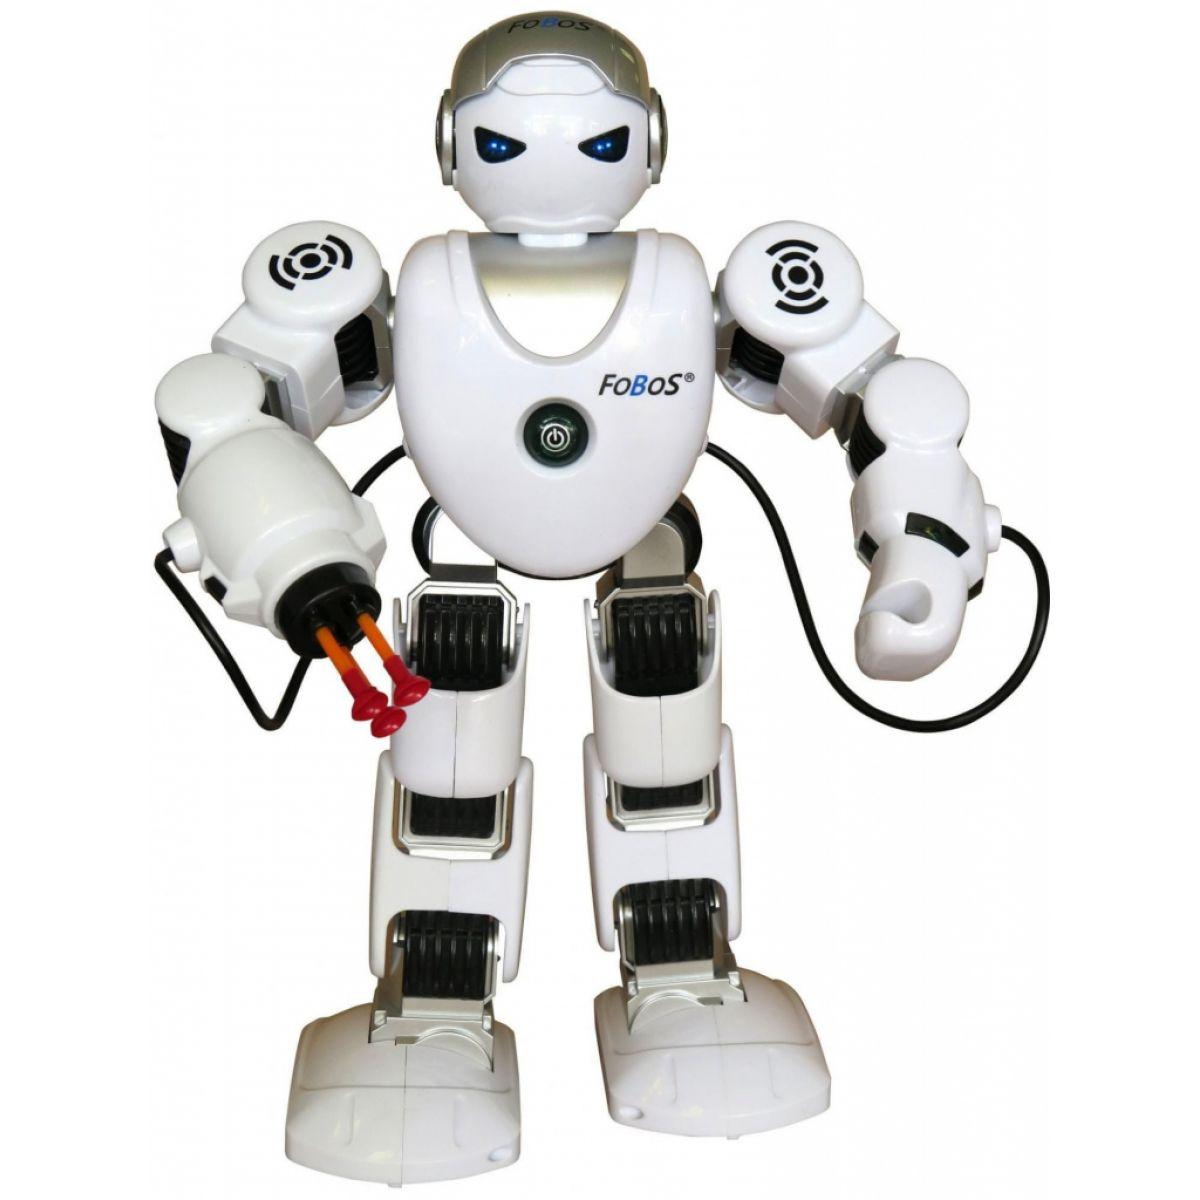 Teddies Robot RC FOBOS interaktivní chodící plast 40cm na baterie s USB